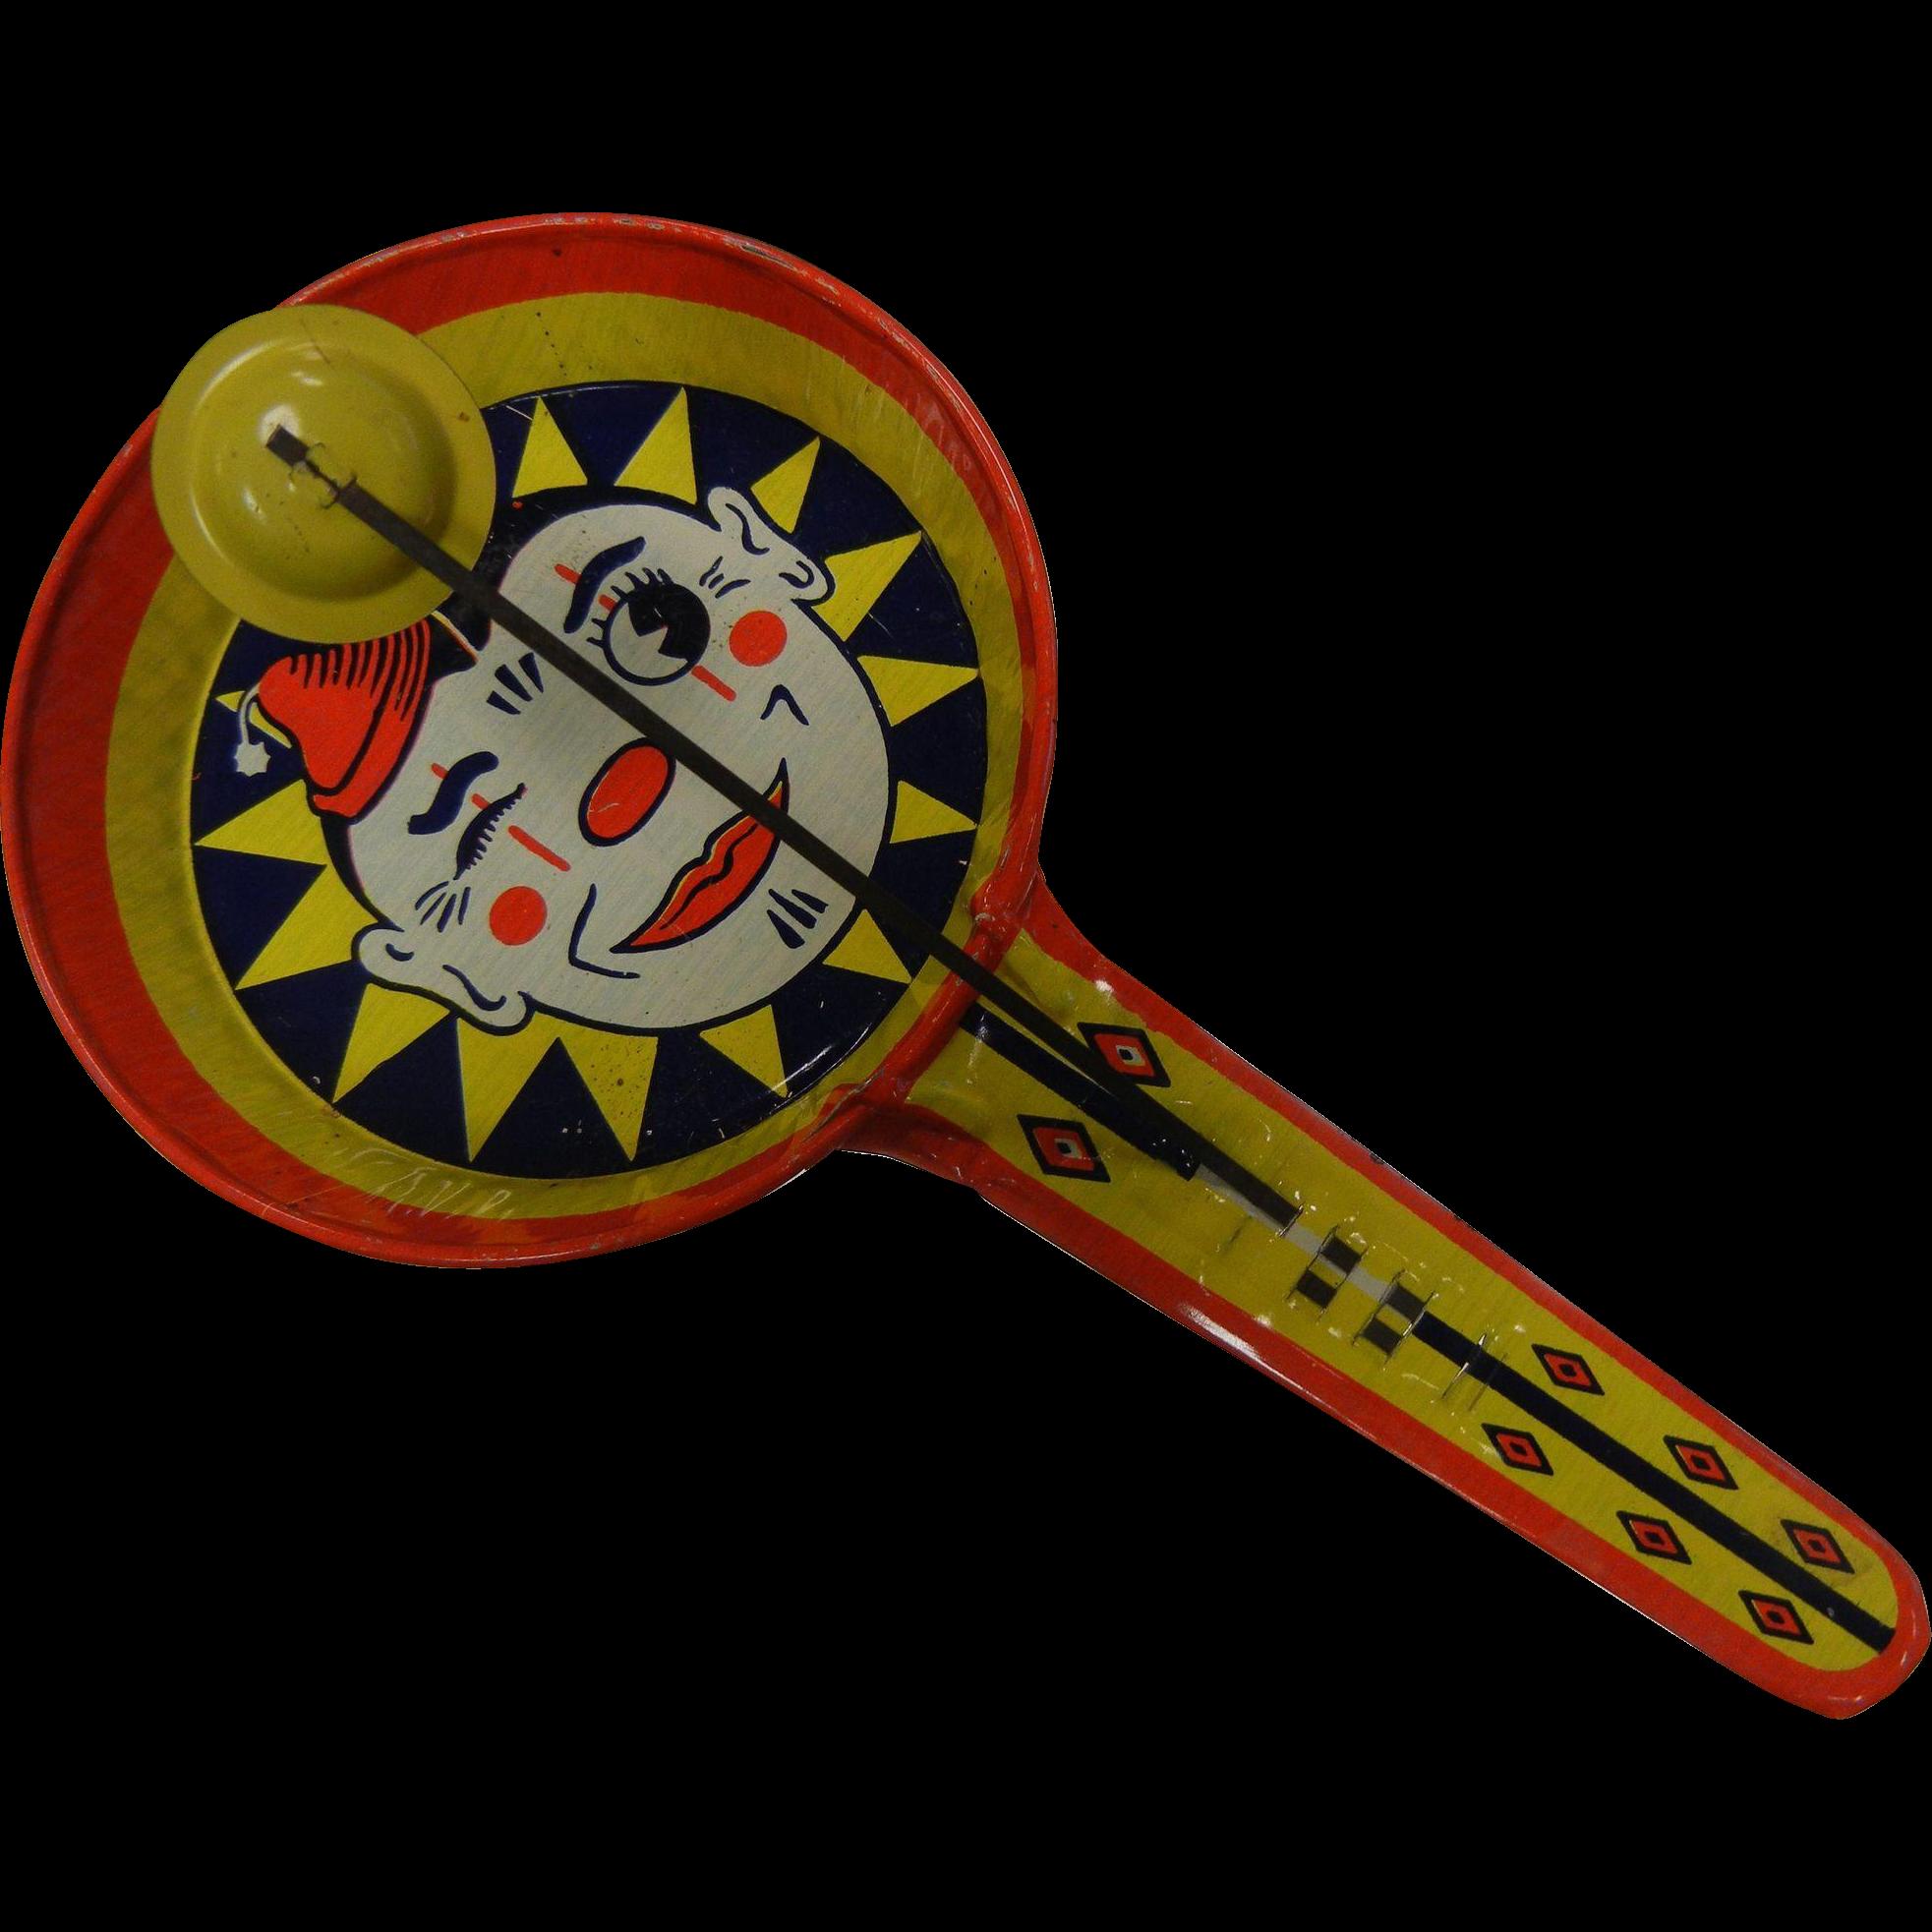 Vintage Kirchhof USA Colorful Clown Noisemaker Metal Toy